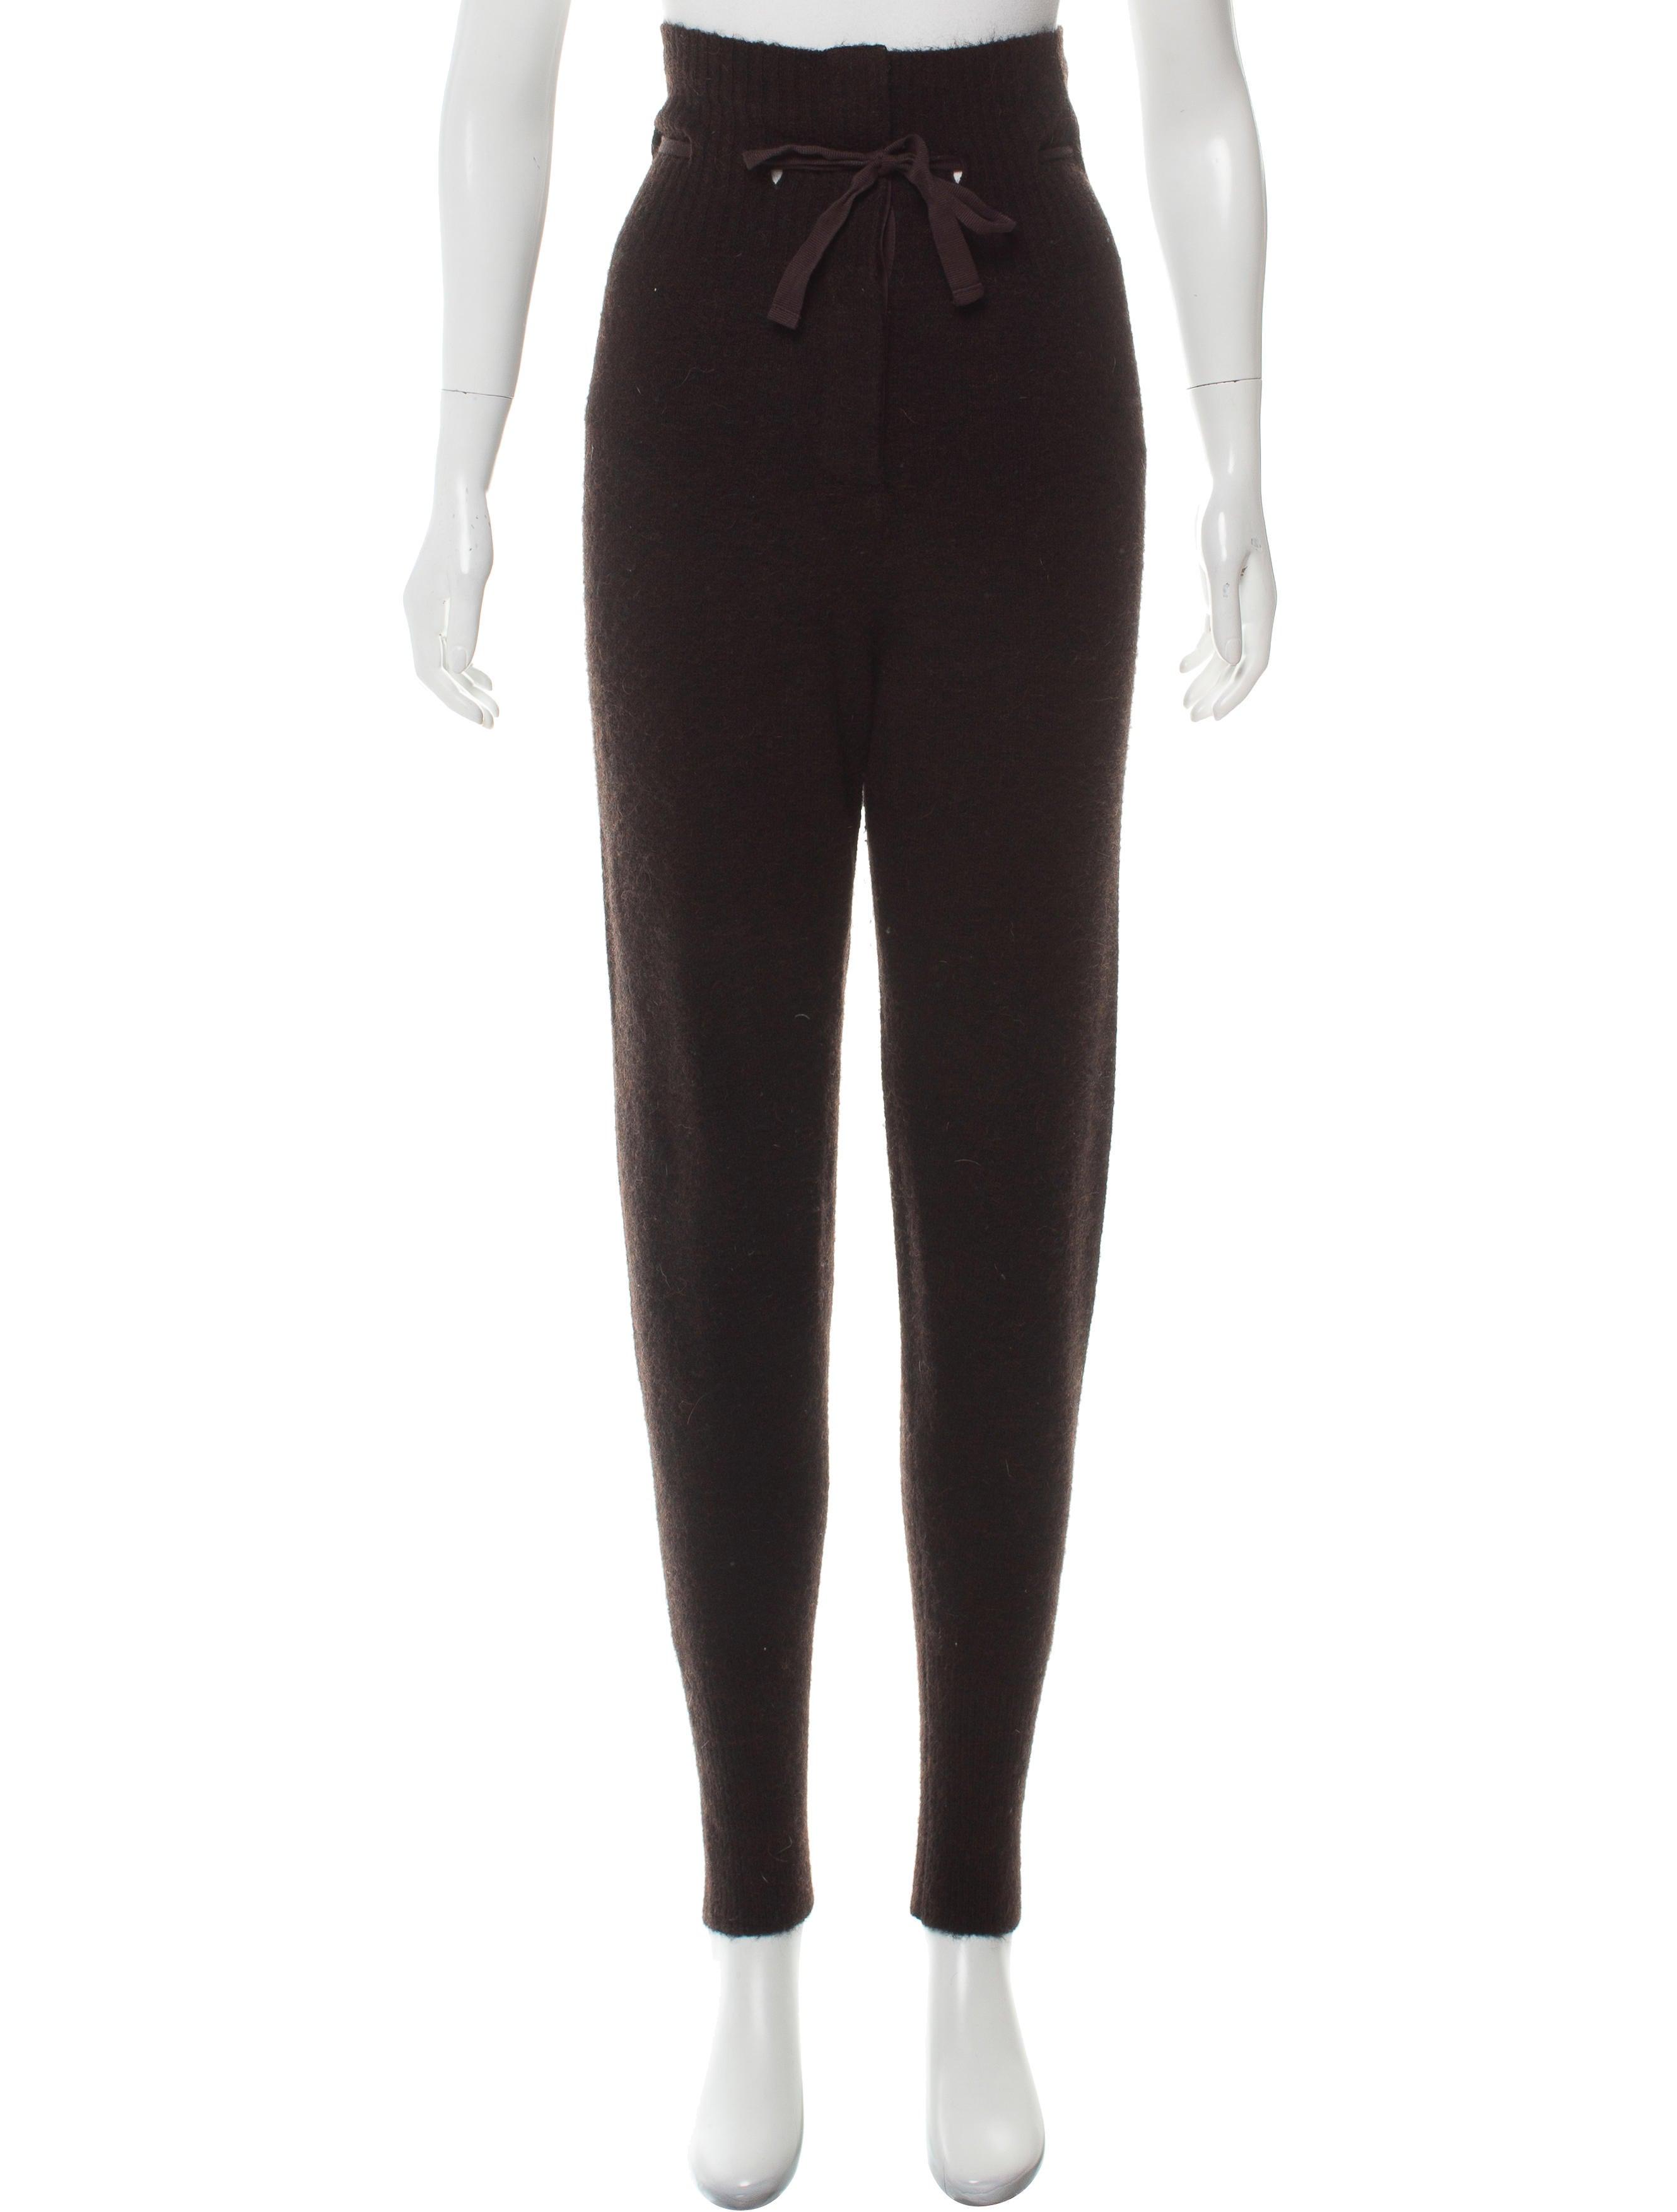 ea2c1f1d73 Étoile Isabel Marant High-Rise Skinny Knit Pants - Clothing - WET67030 |  The RealReal